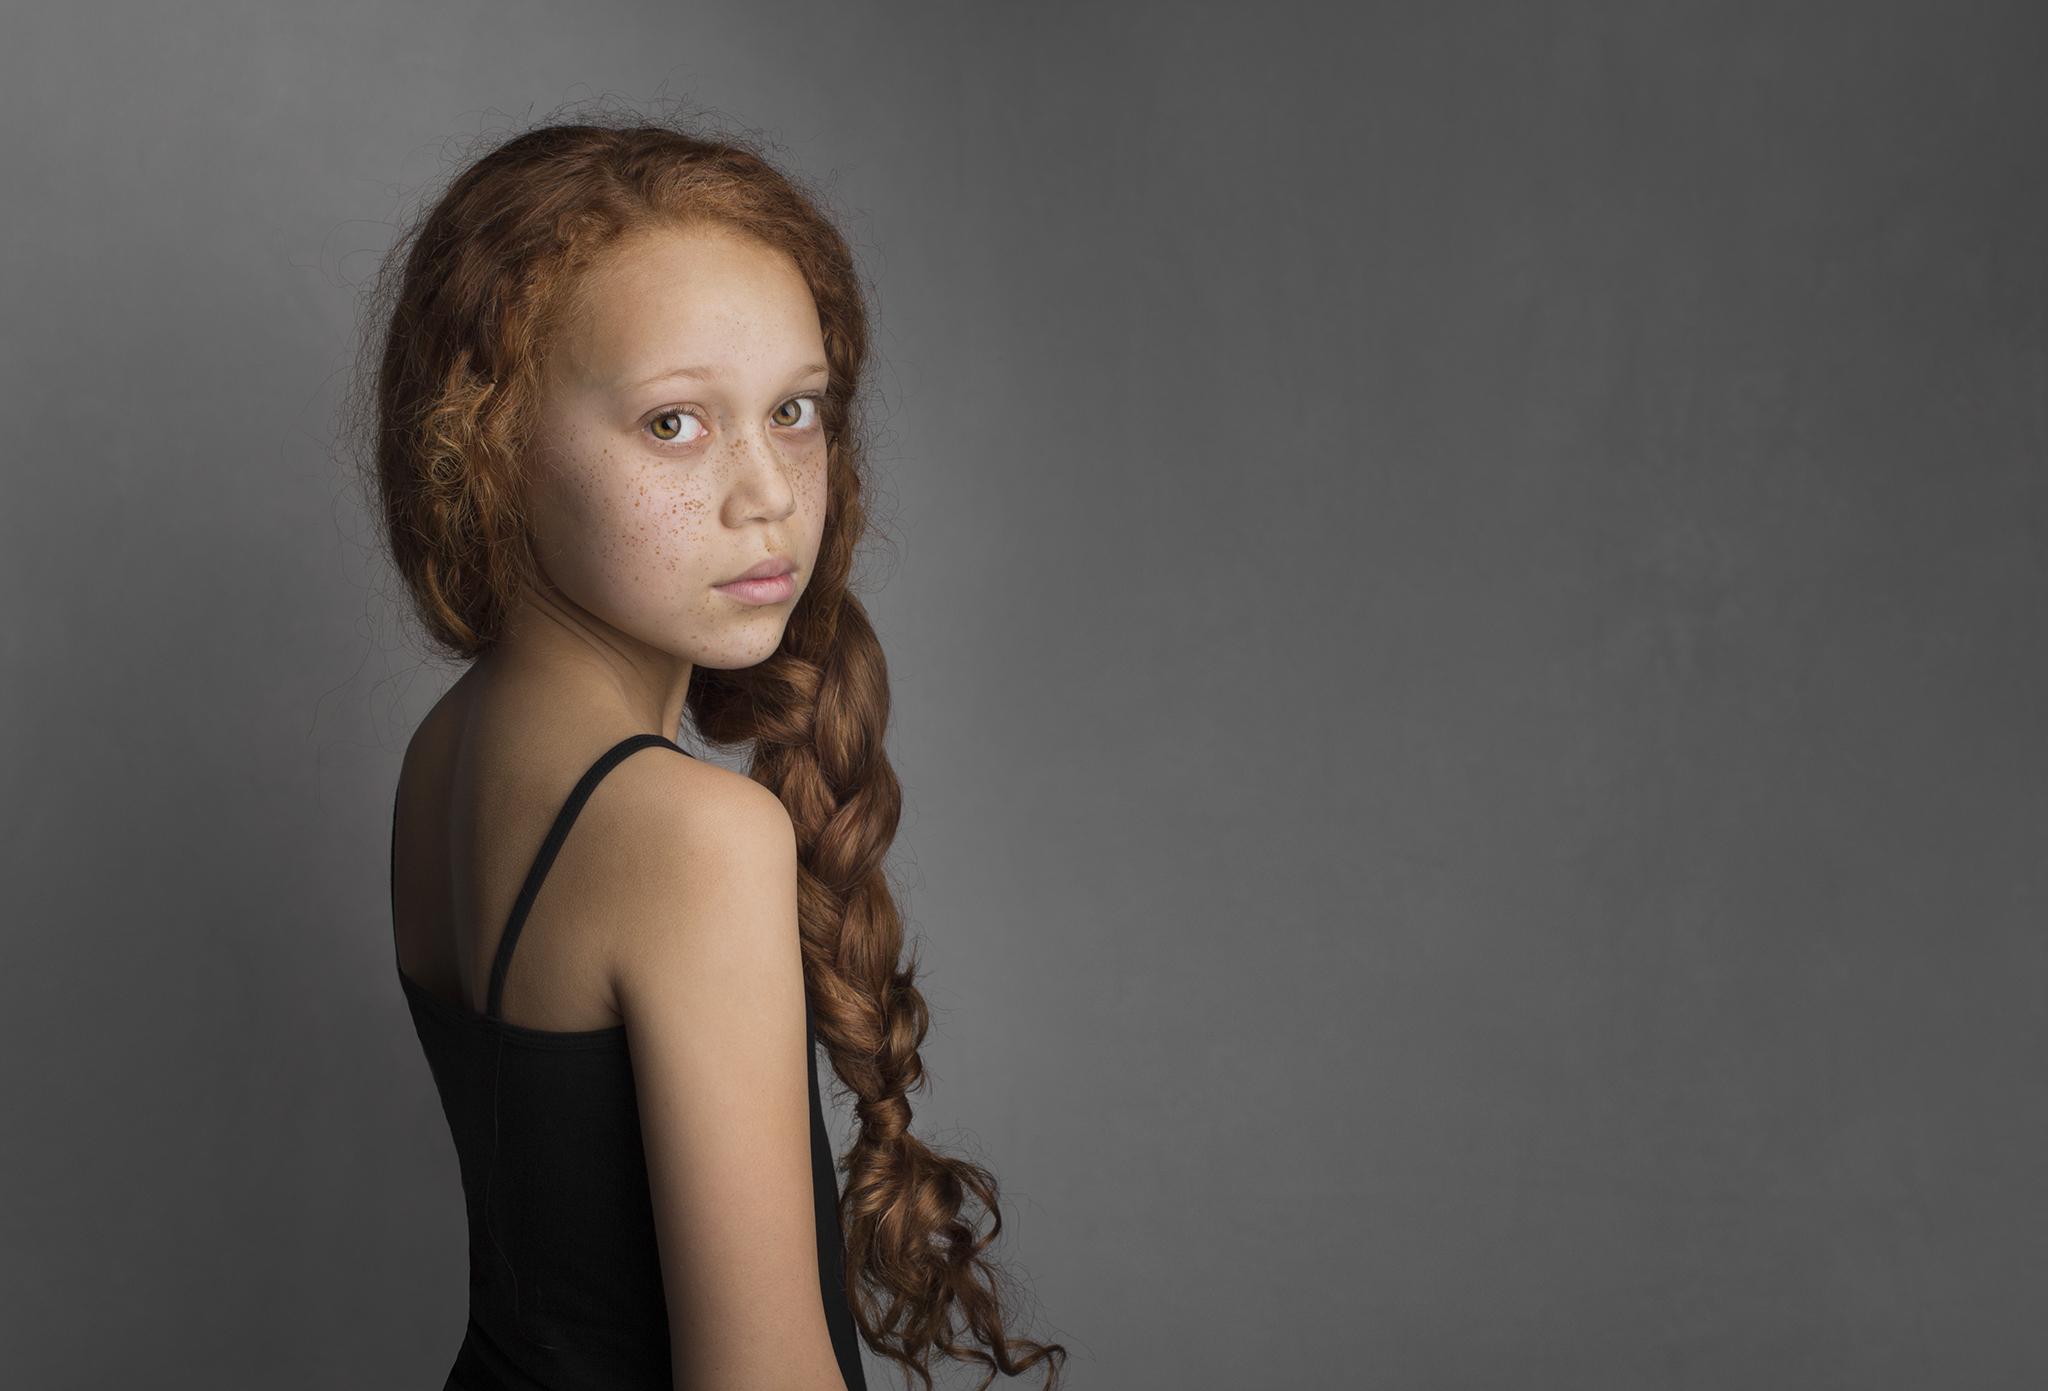 elizabethg_photography_hertfordshire_fineart_child_portrait_model_tiarna_williams_05.jpg